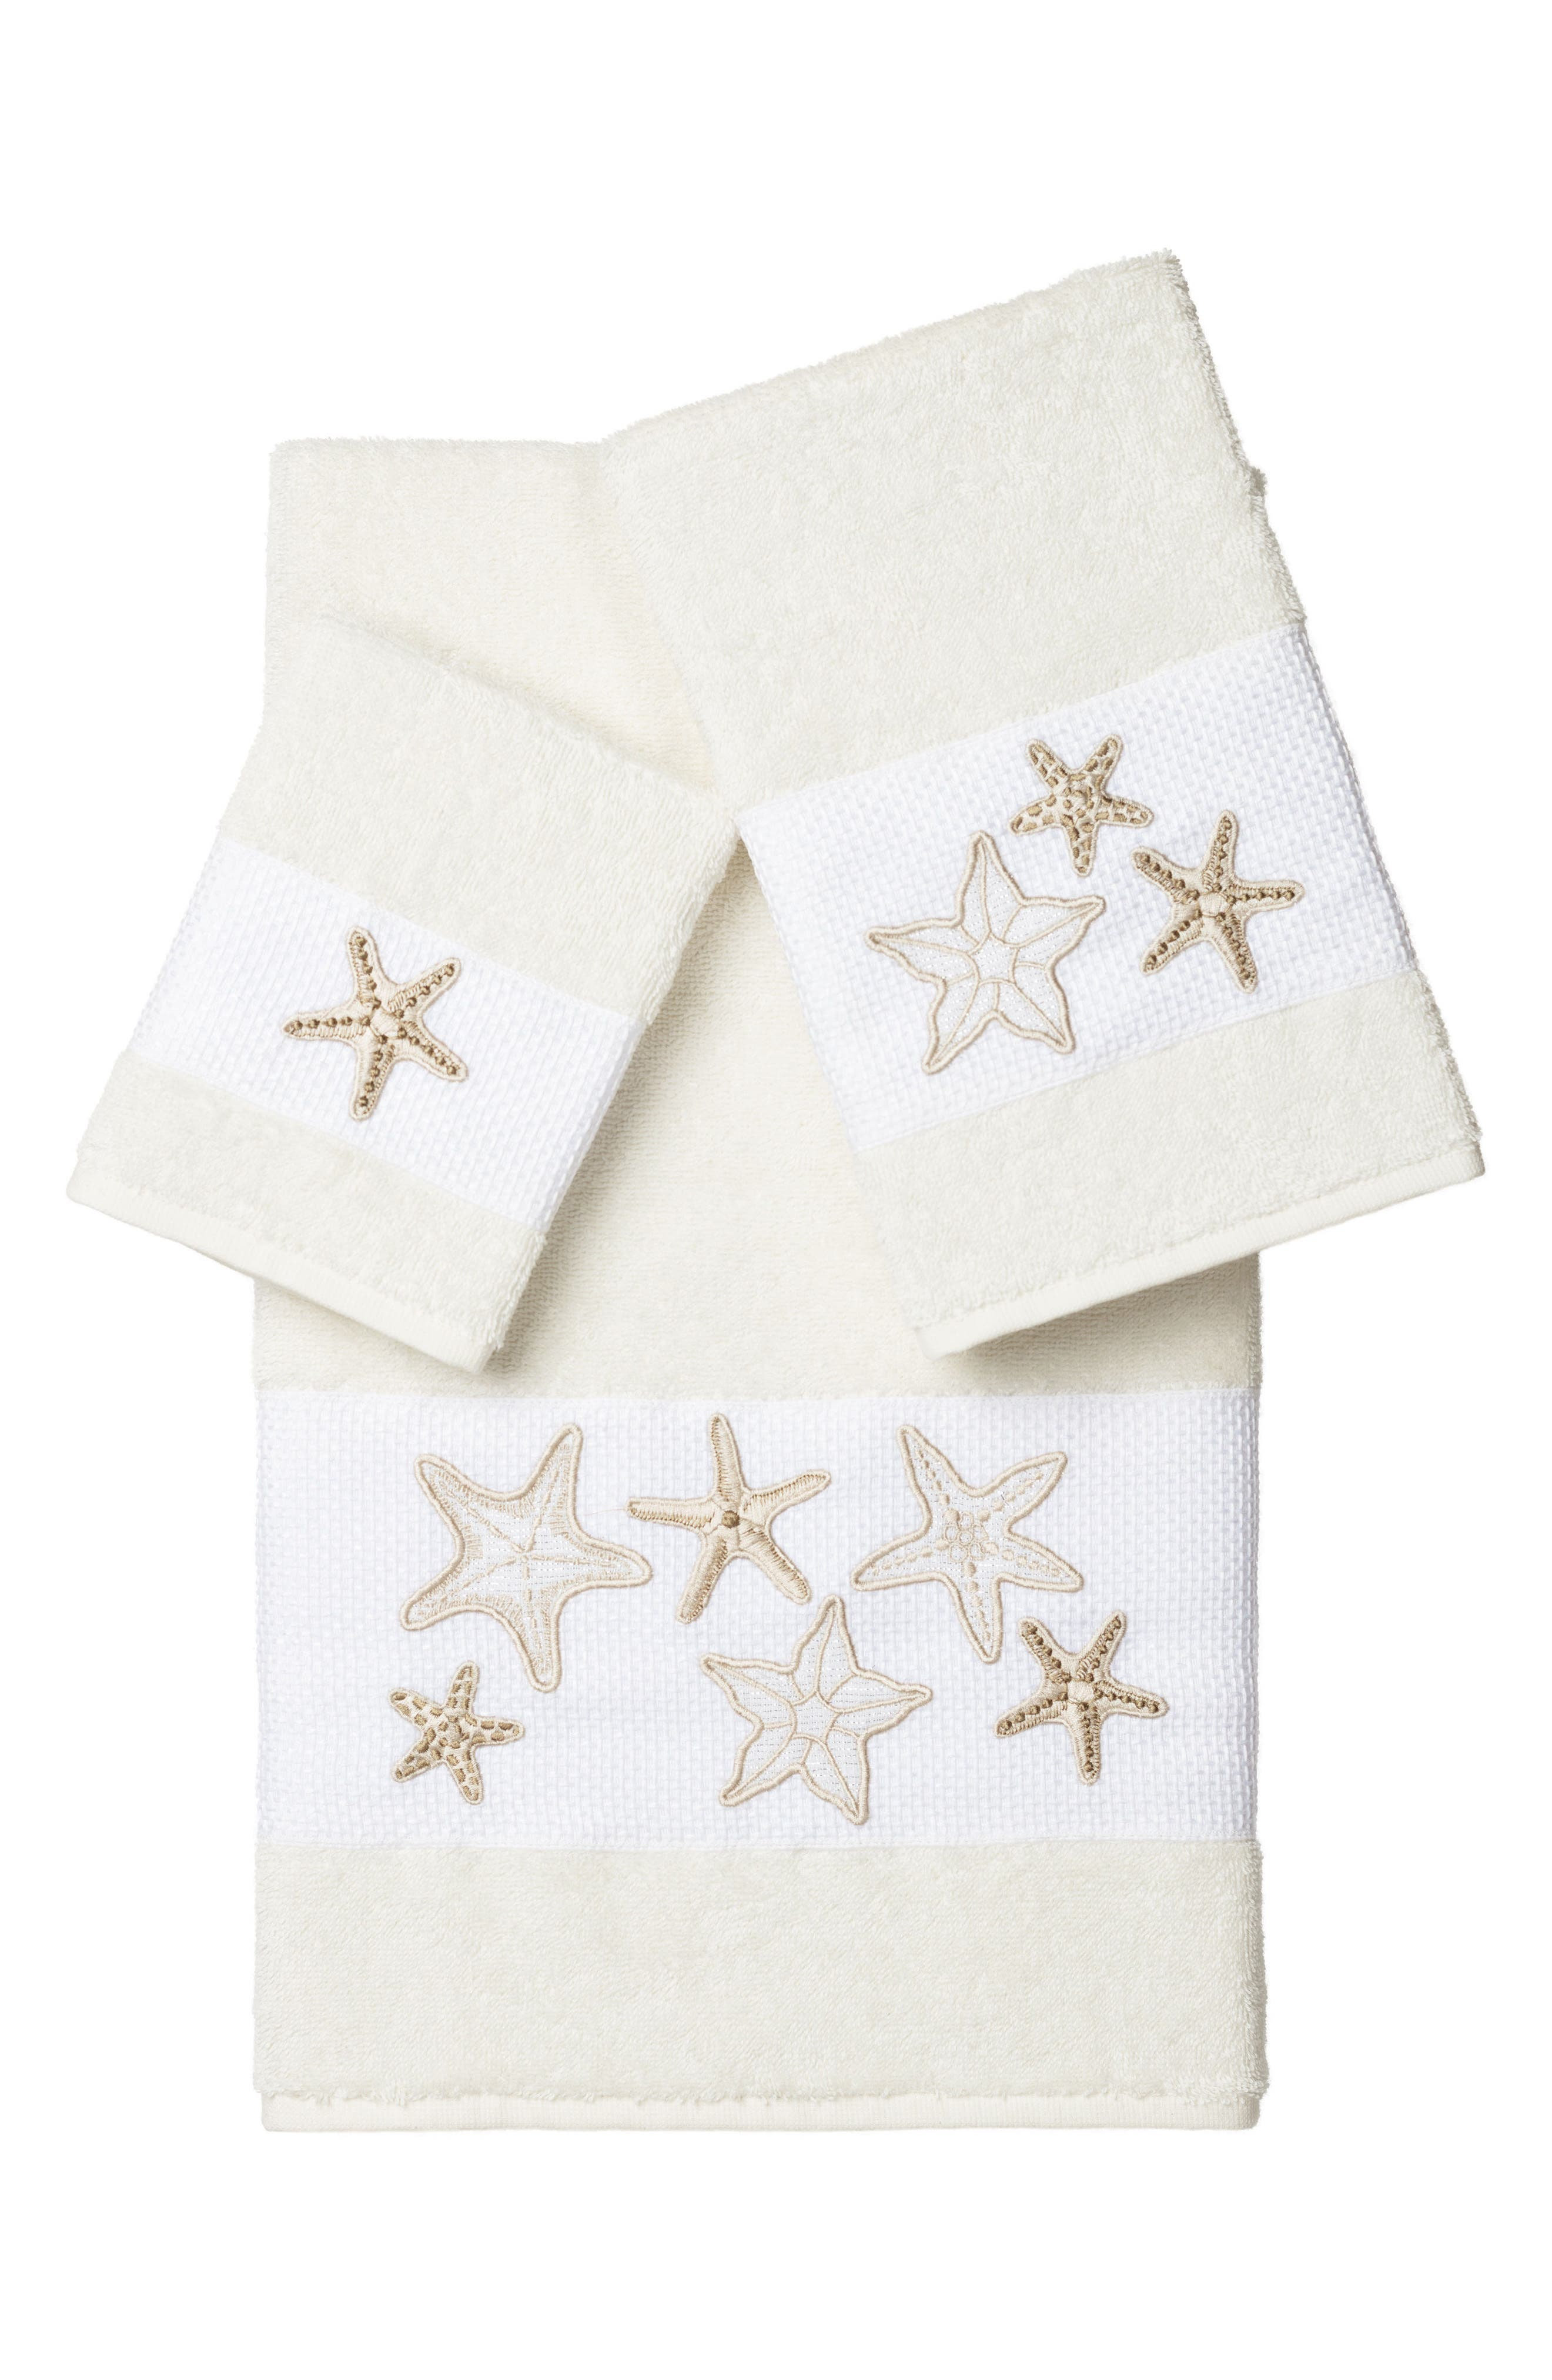 Lydia 3-Piece Turkish Cotton Towel Set,                         Main,                         color, Cream